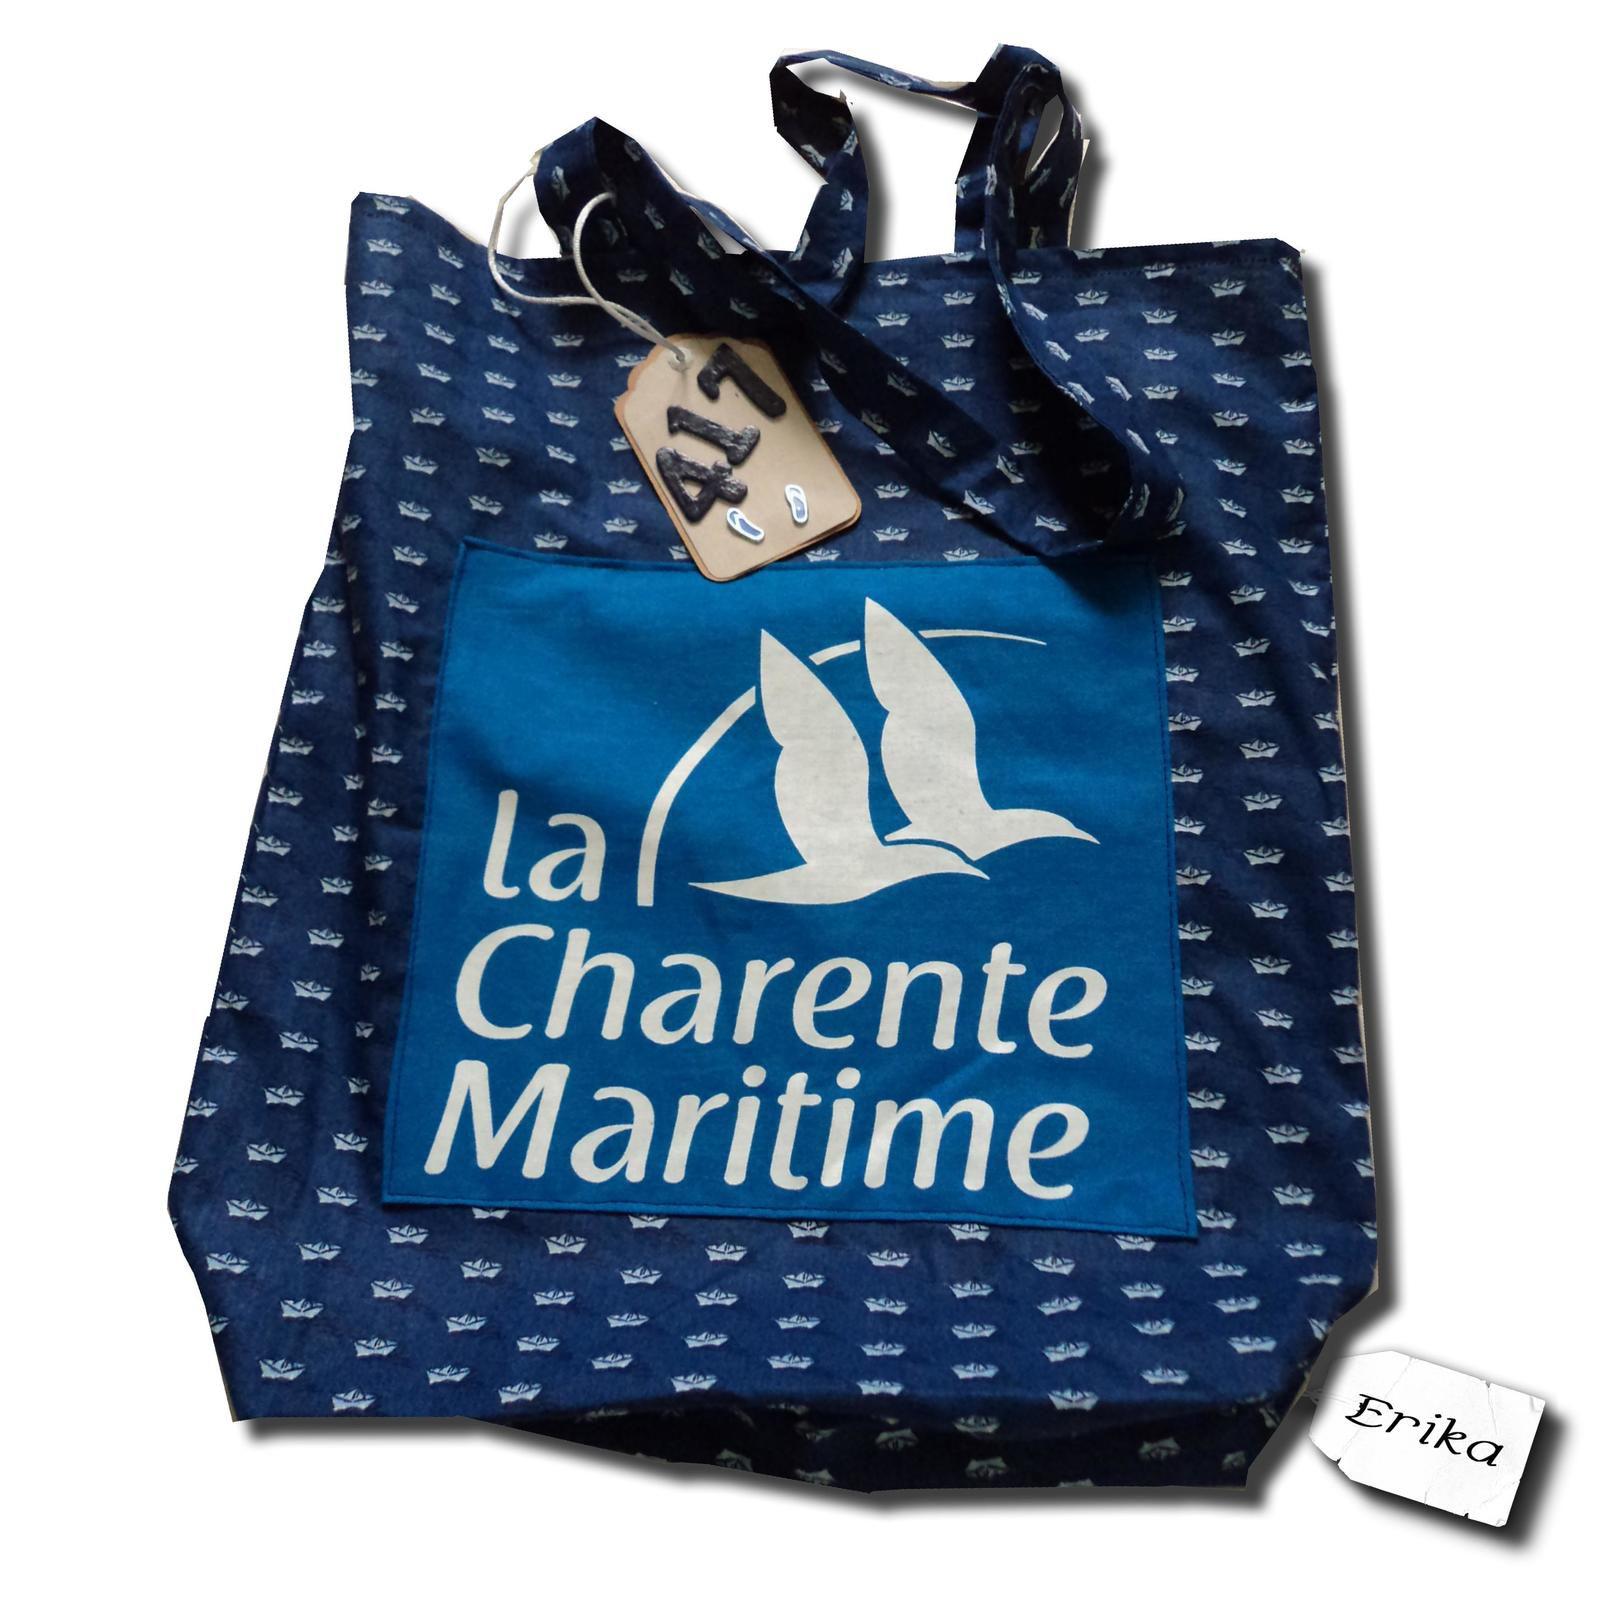 Sac Charente Maritime n°417 à Porto Rafti en Grèce...